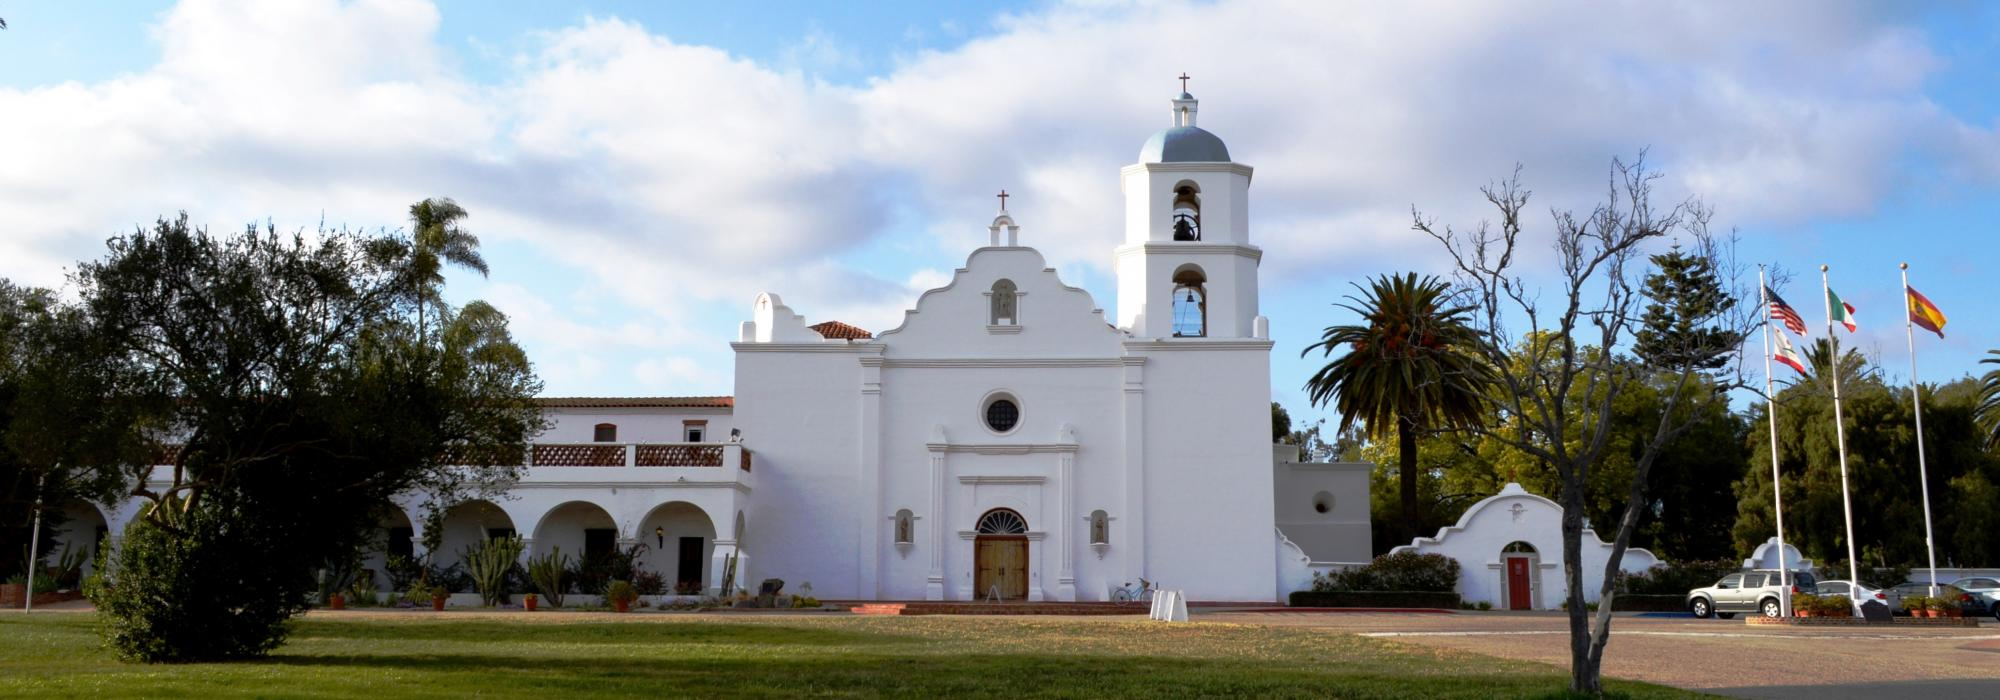 CA_SanDiego_Mission_San_Luis_Rey_de_Francia_Nandaro_2014_WikimediaCommons_002_hero.jpg